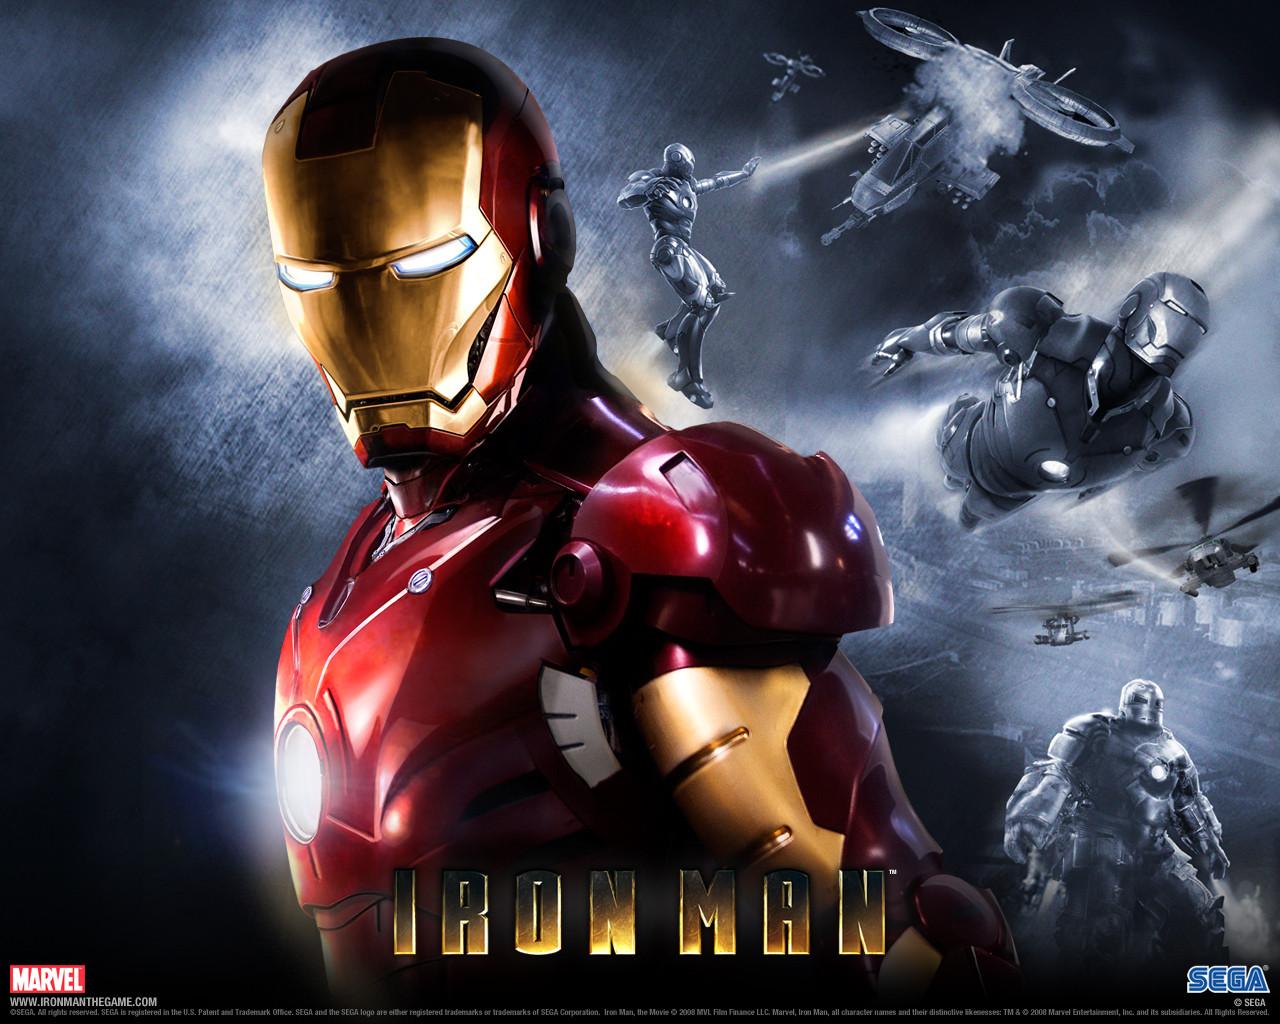 Iron Man Games - Play Iron Man Online Games